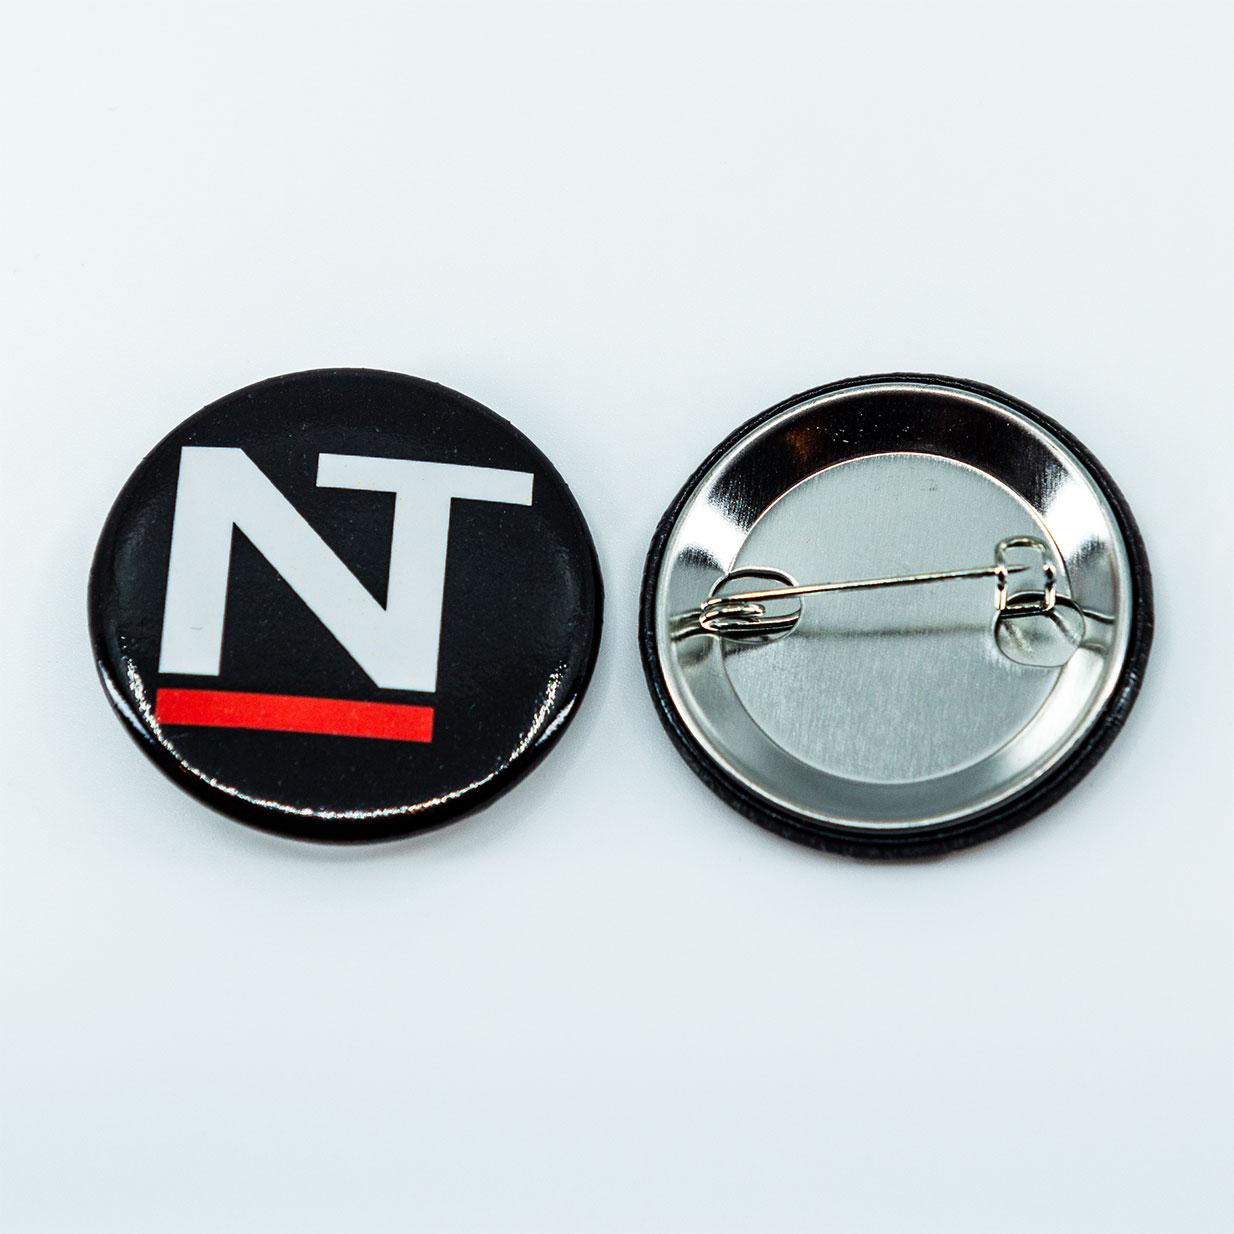 NT-Pins.jpg